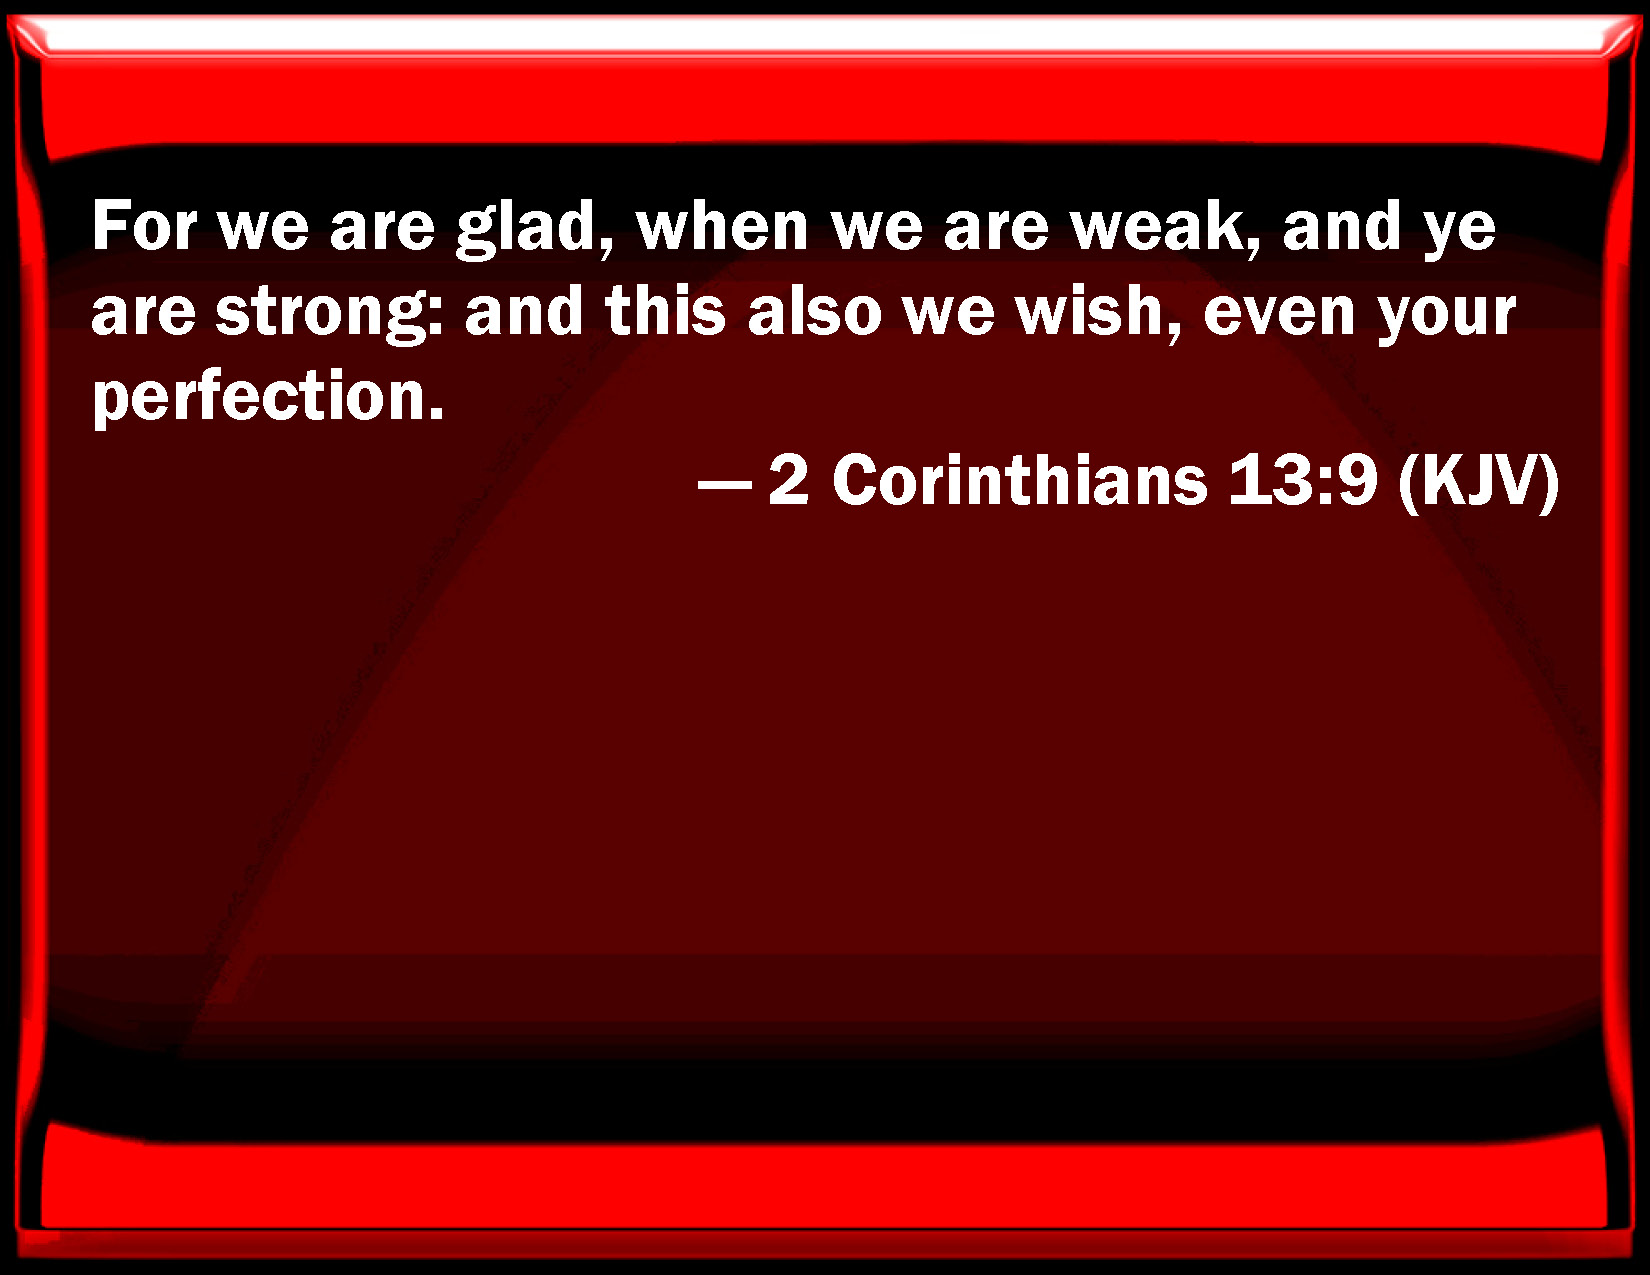 2 Corinthians 13:9